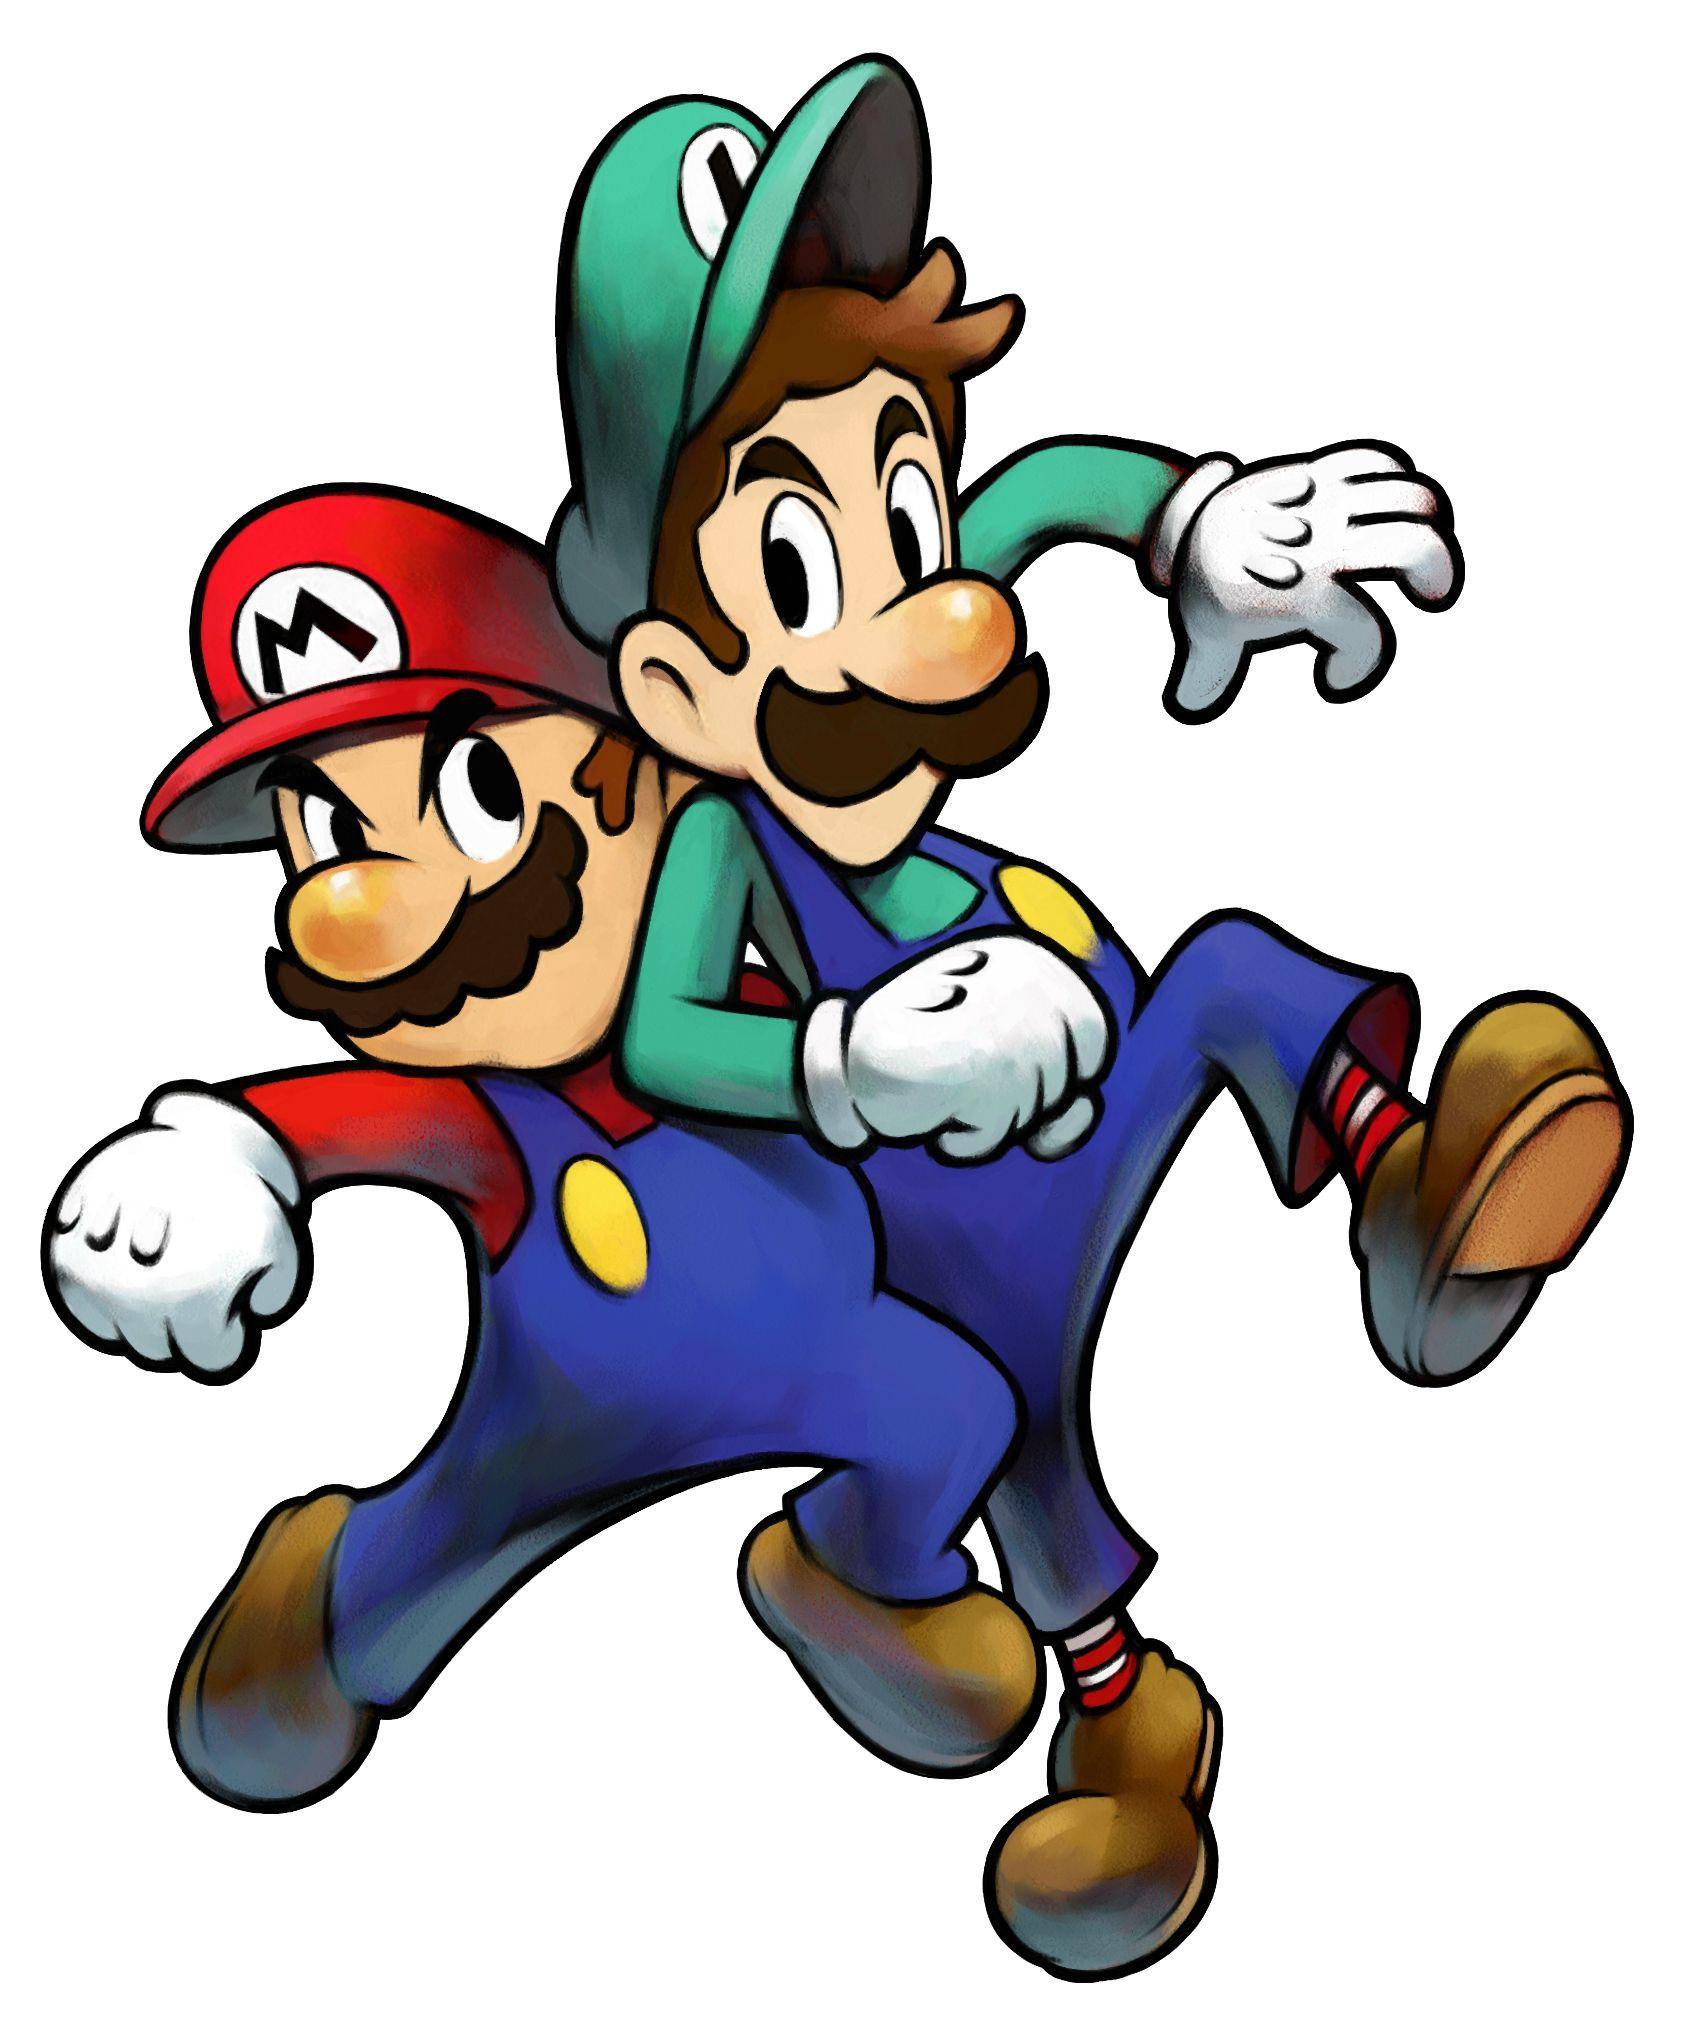 12026 - Solo para expertos de Mario & Luigi [RPG]